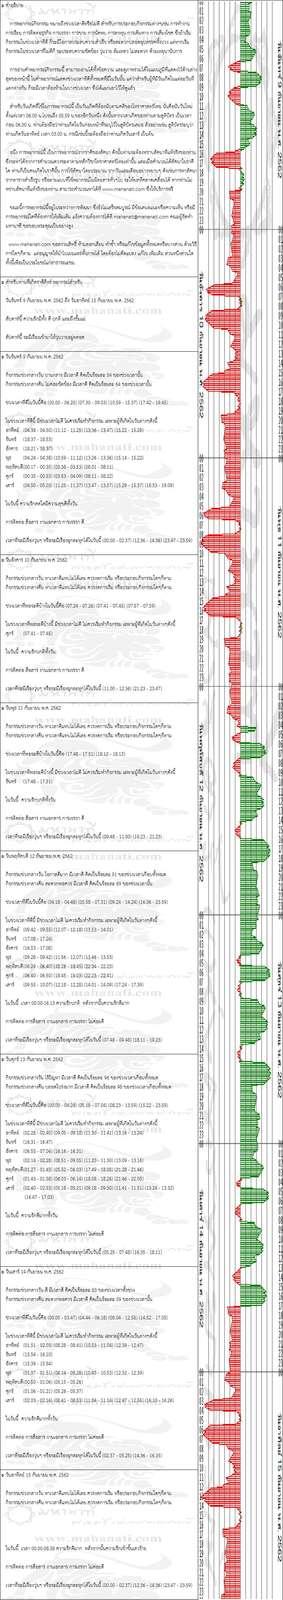 pxajxn2pdP79Kch46CD-o.jpg